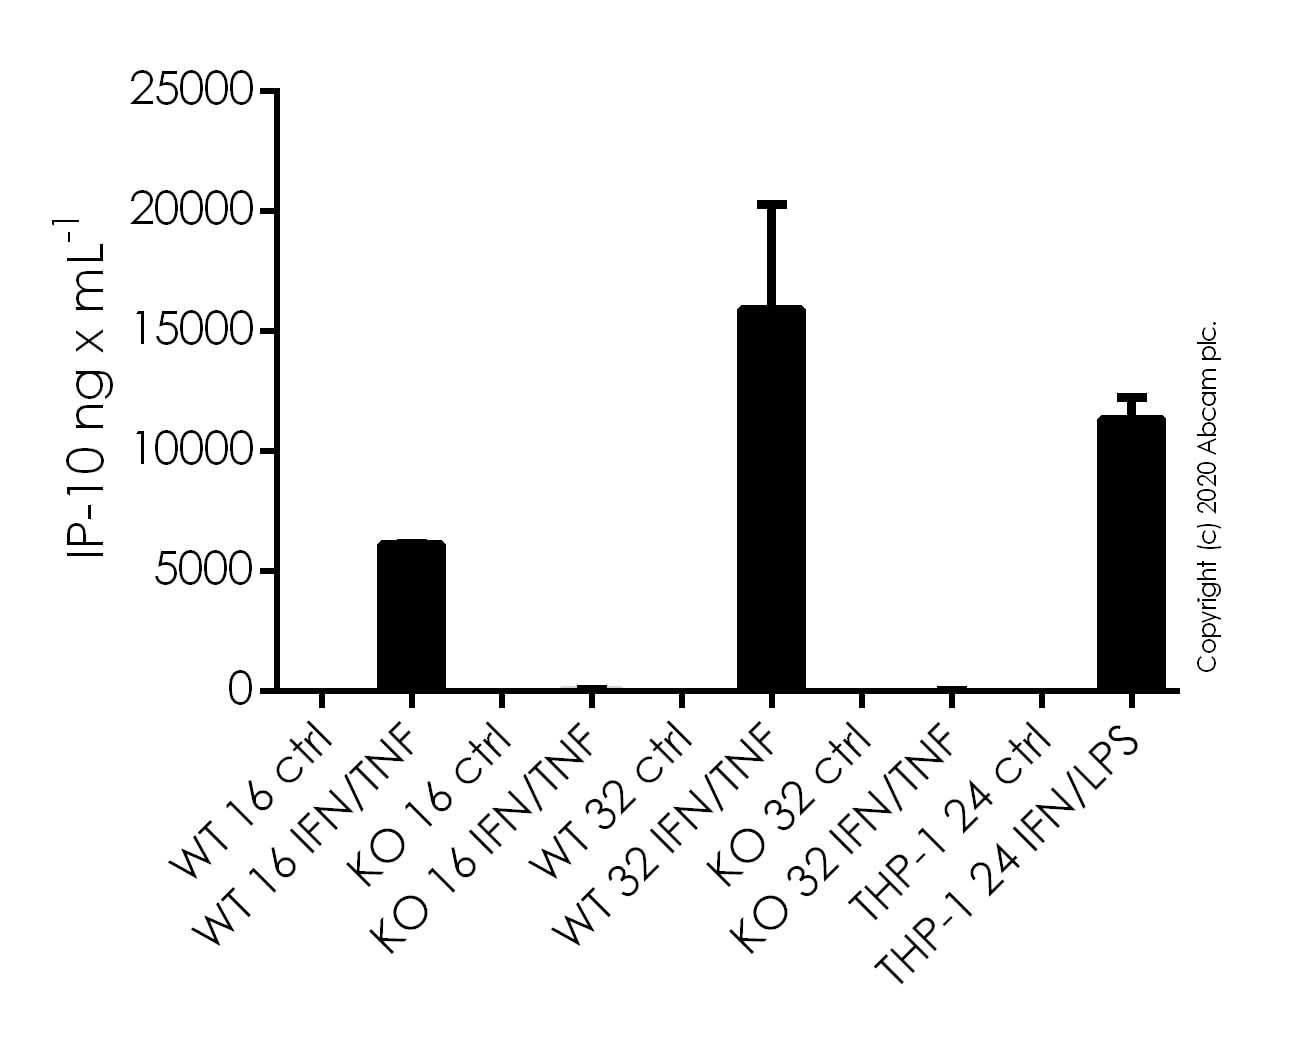 ELISA - Recombinant human TNF alpha protein (Active) (ab259410)